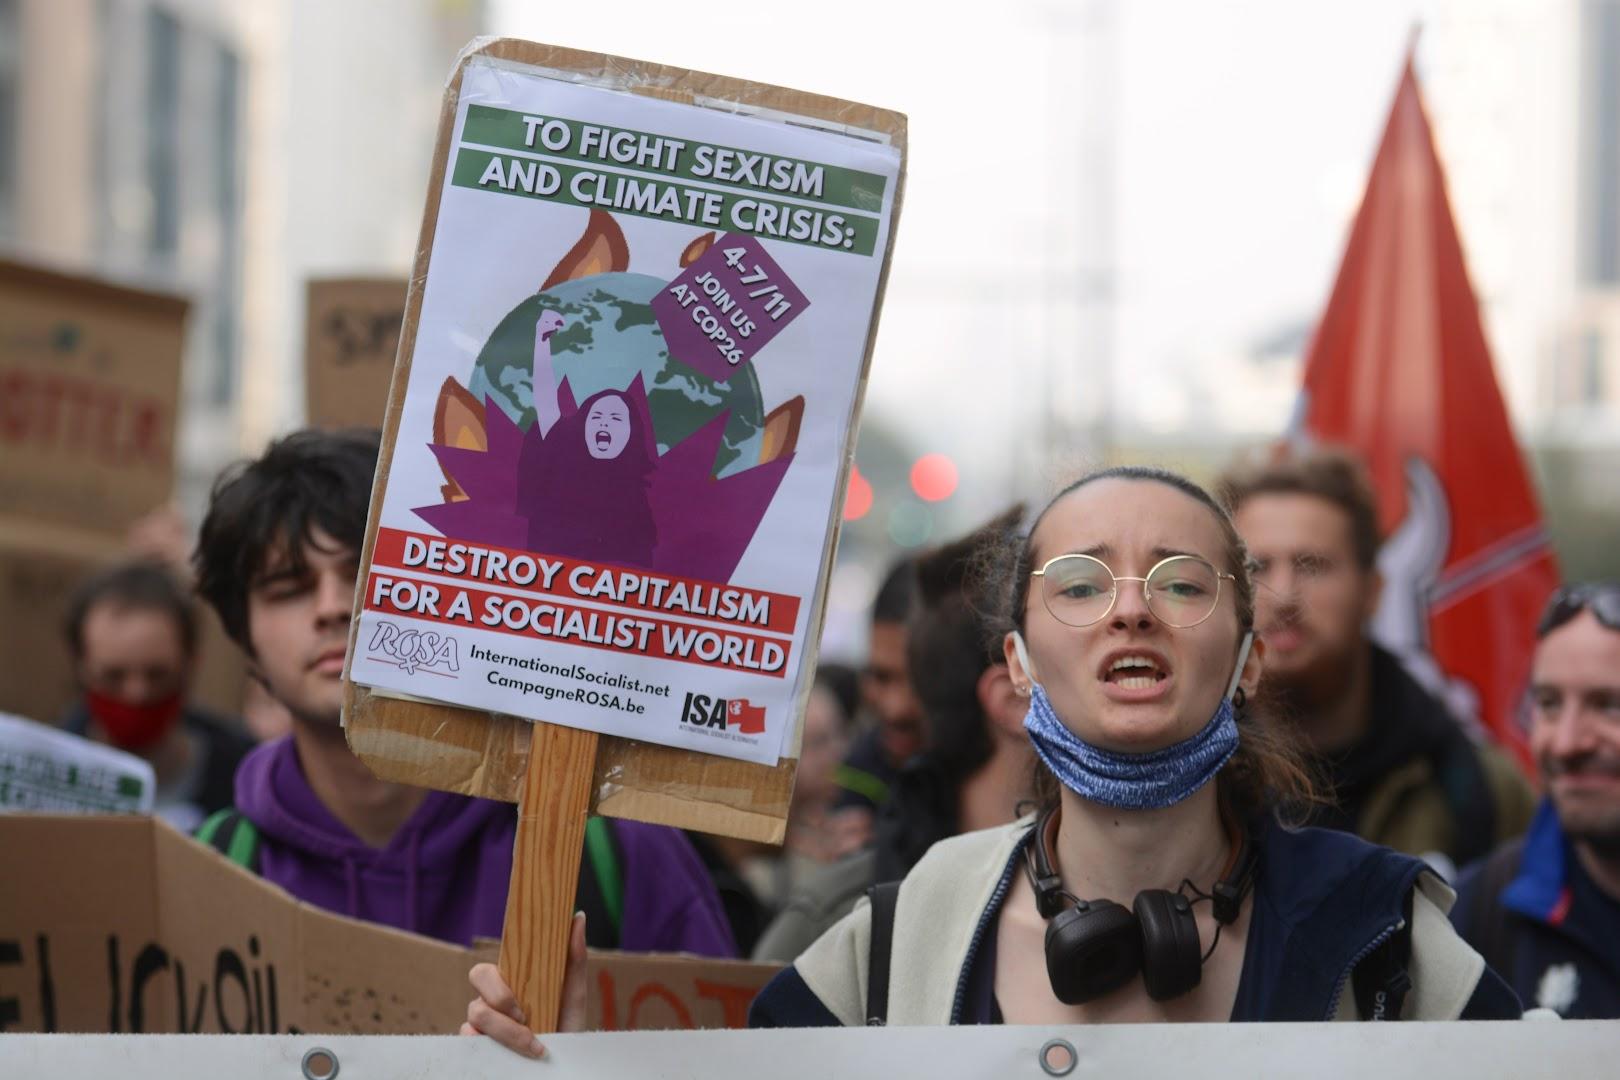 Straffe klimaatbetoging brengt 70.000 mensen naar Brussel